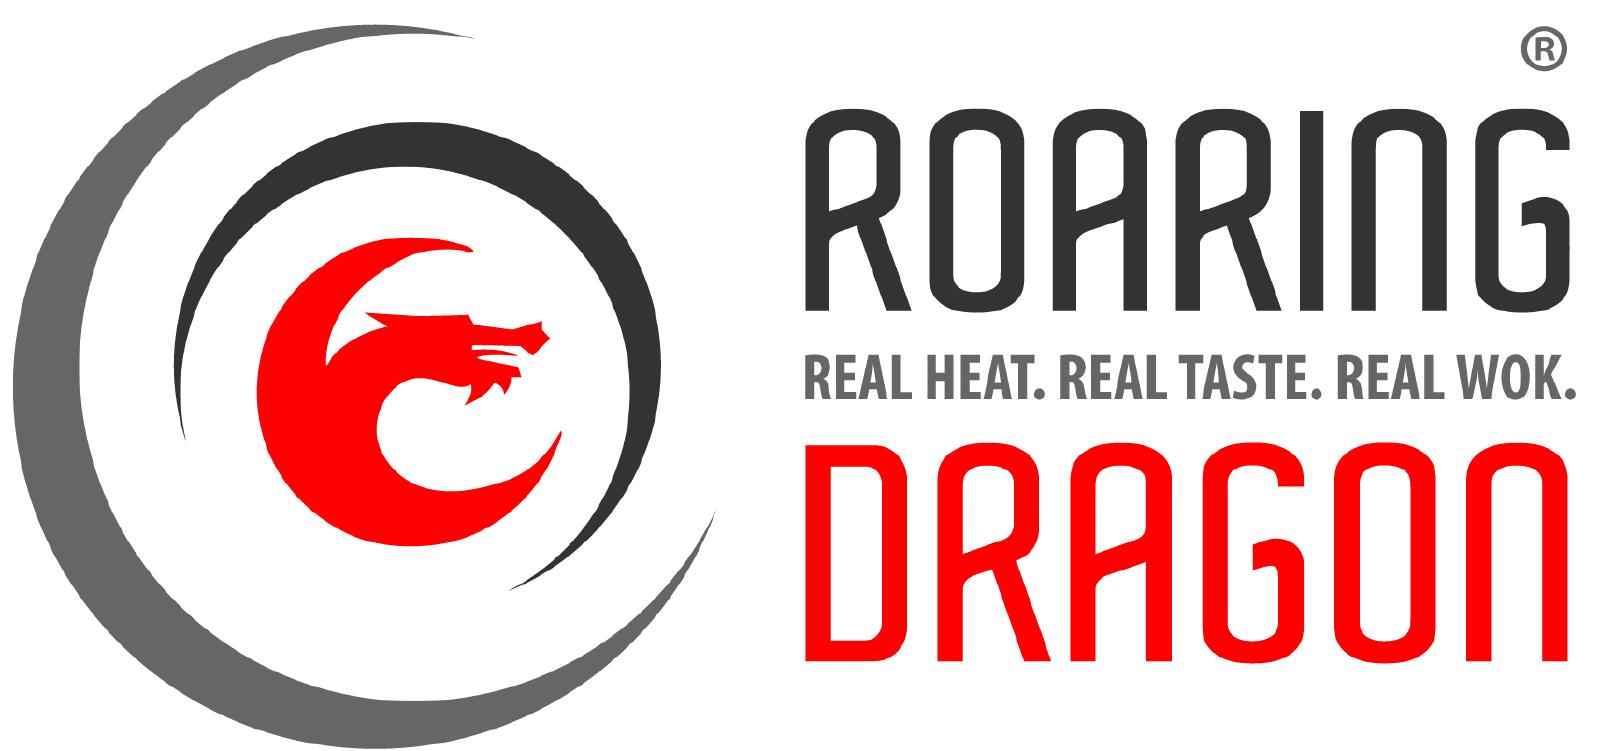 Roaring Dragon Wokbrenner roaring dragon-RoaringDragon05-Gewinne einen Roaring Dragon MH 76 Ultra BBQ im Wert von 1198 Euro